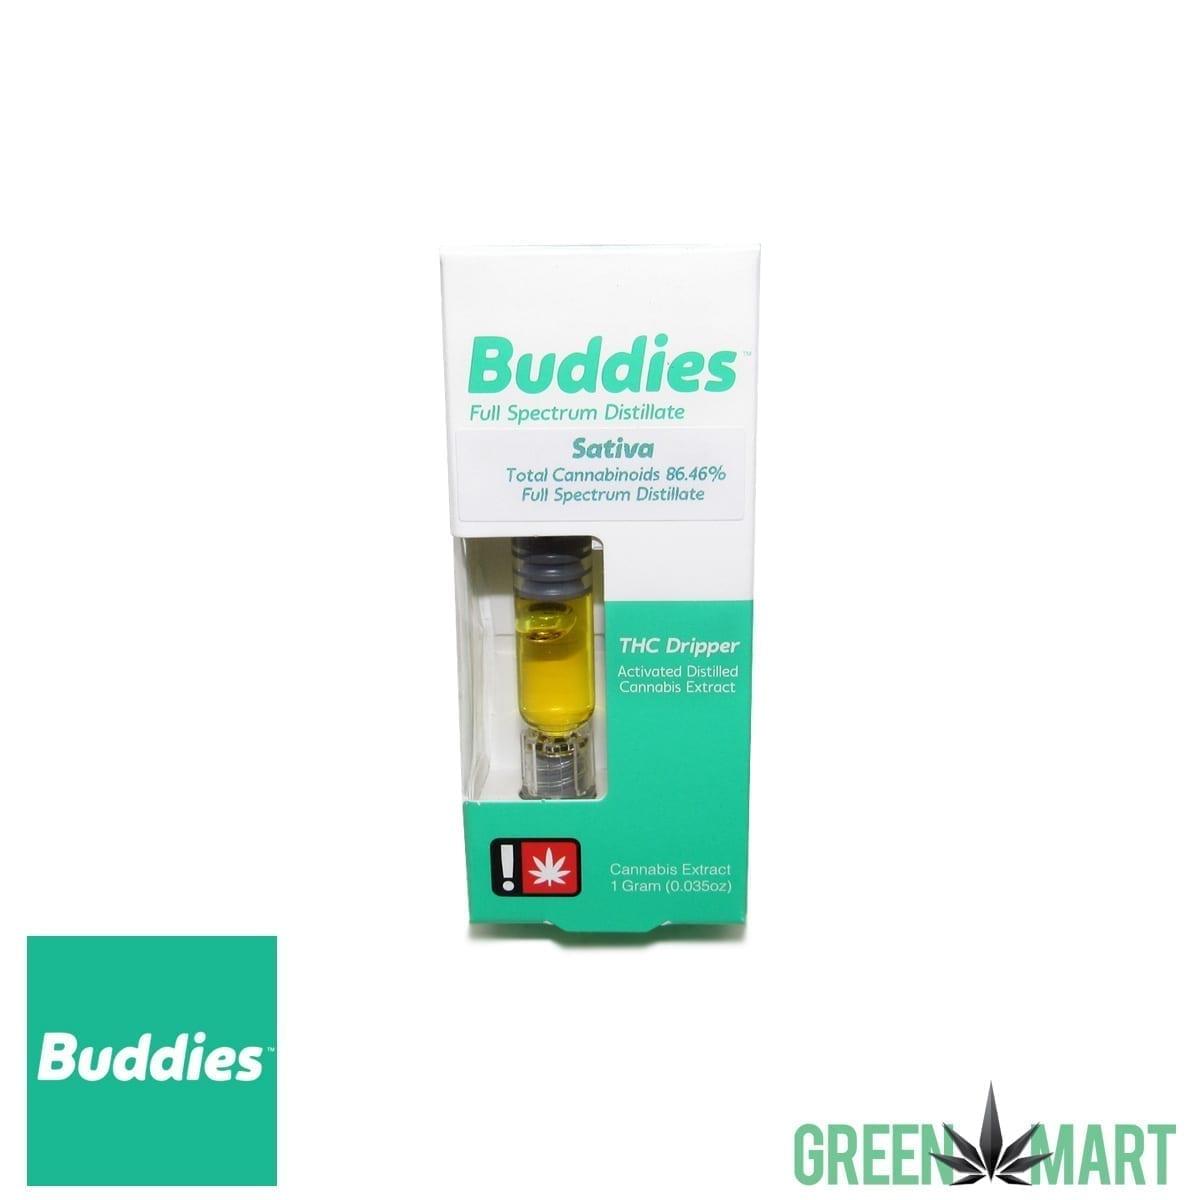 Buddies Brand Sativa THC Dripper